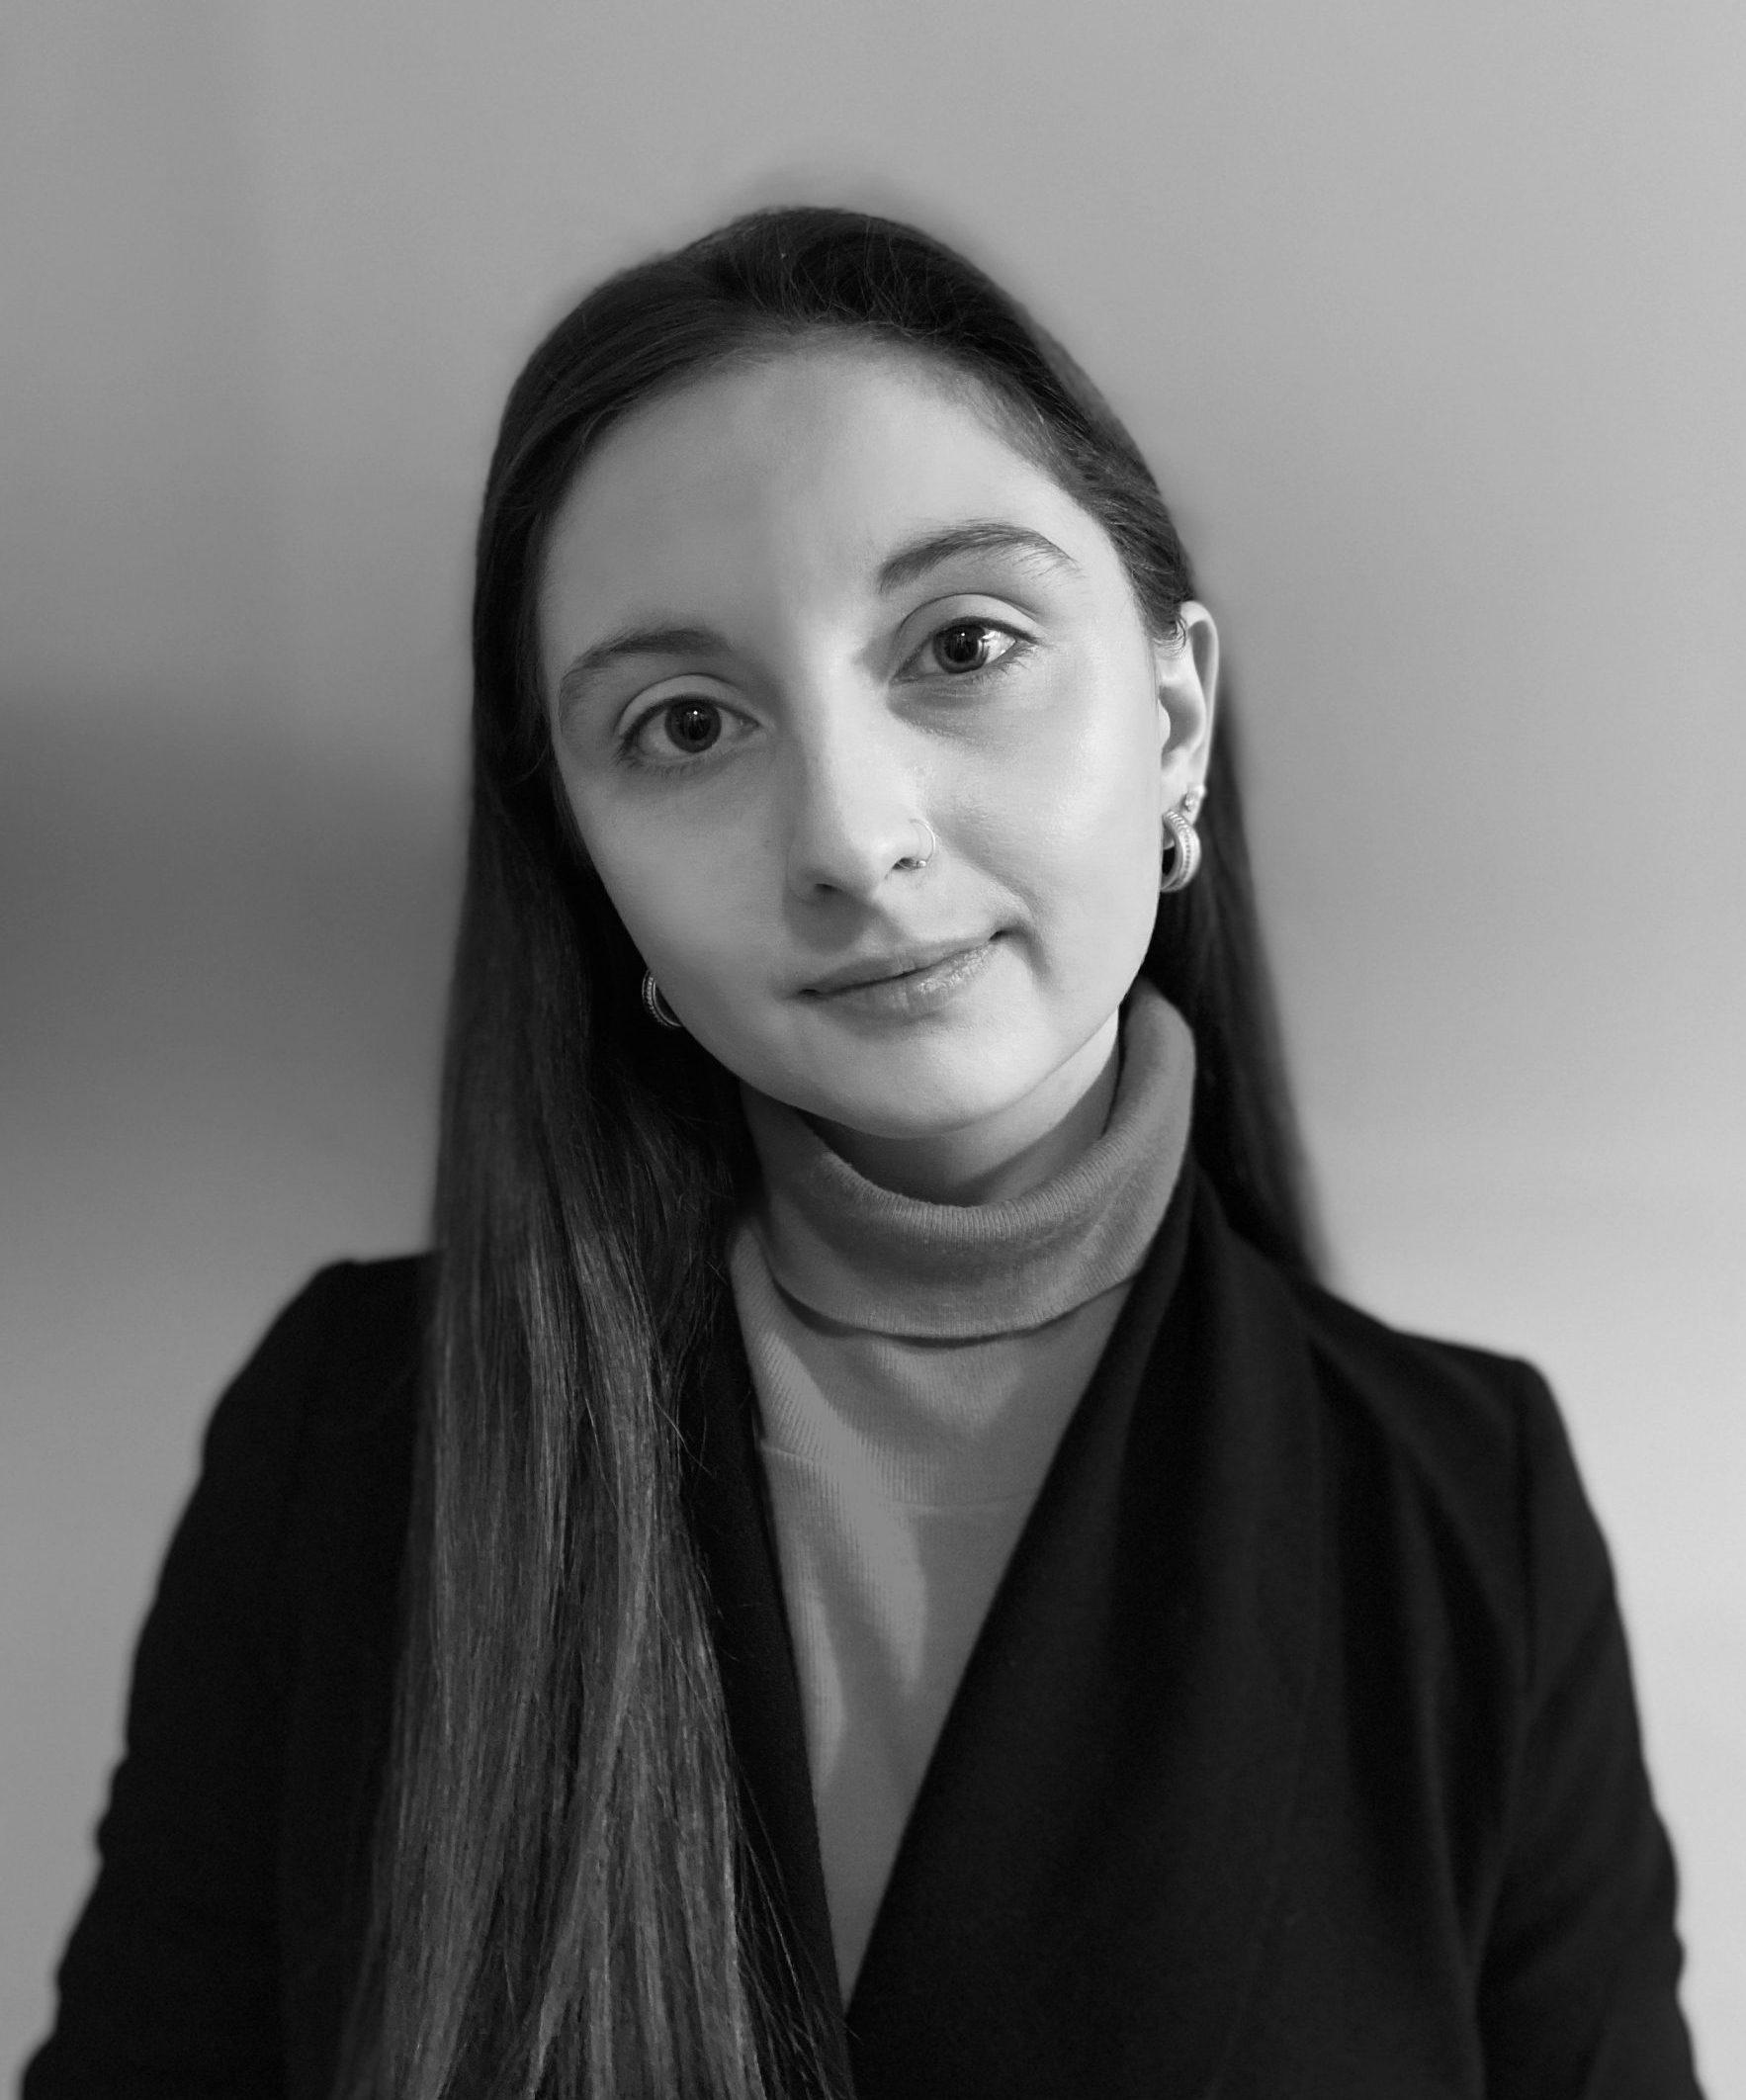 headshot of presenter Melina Zaccaria